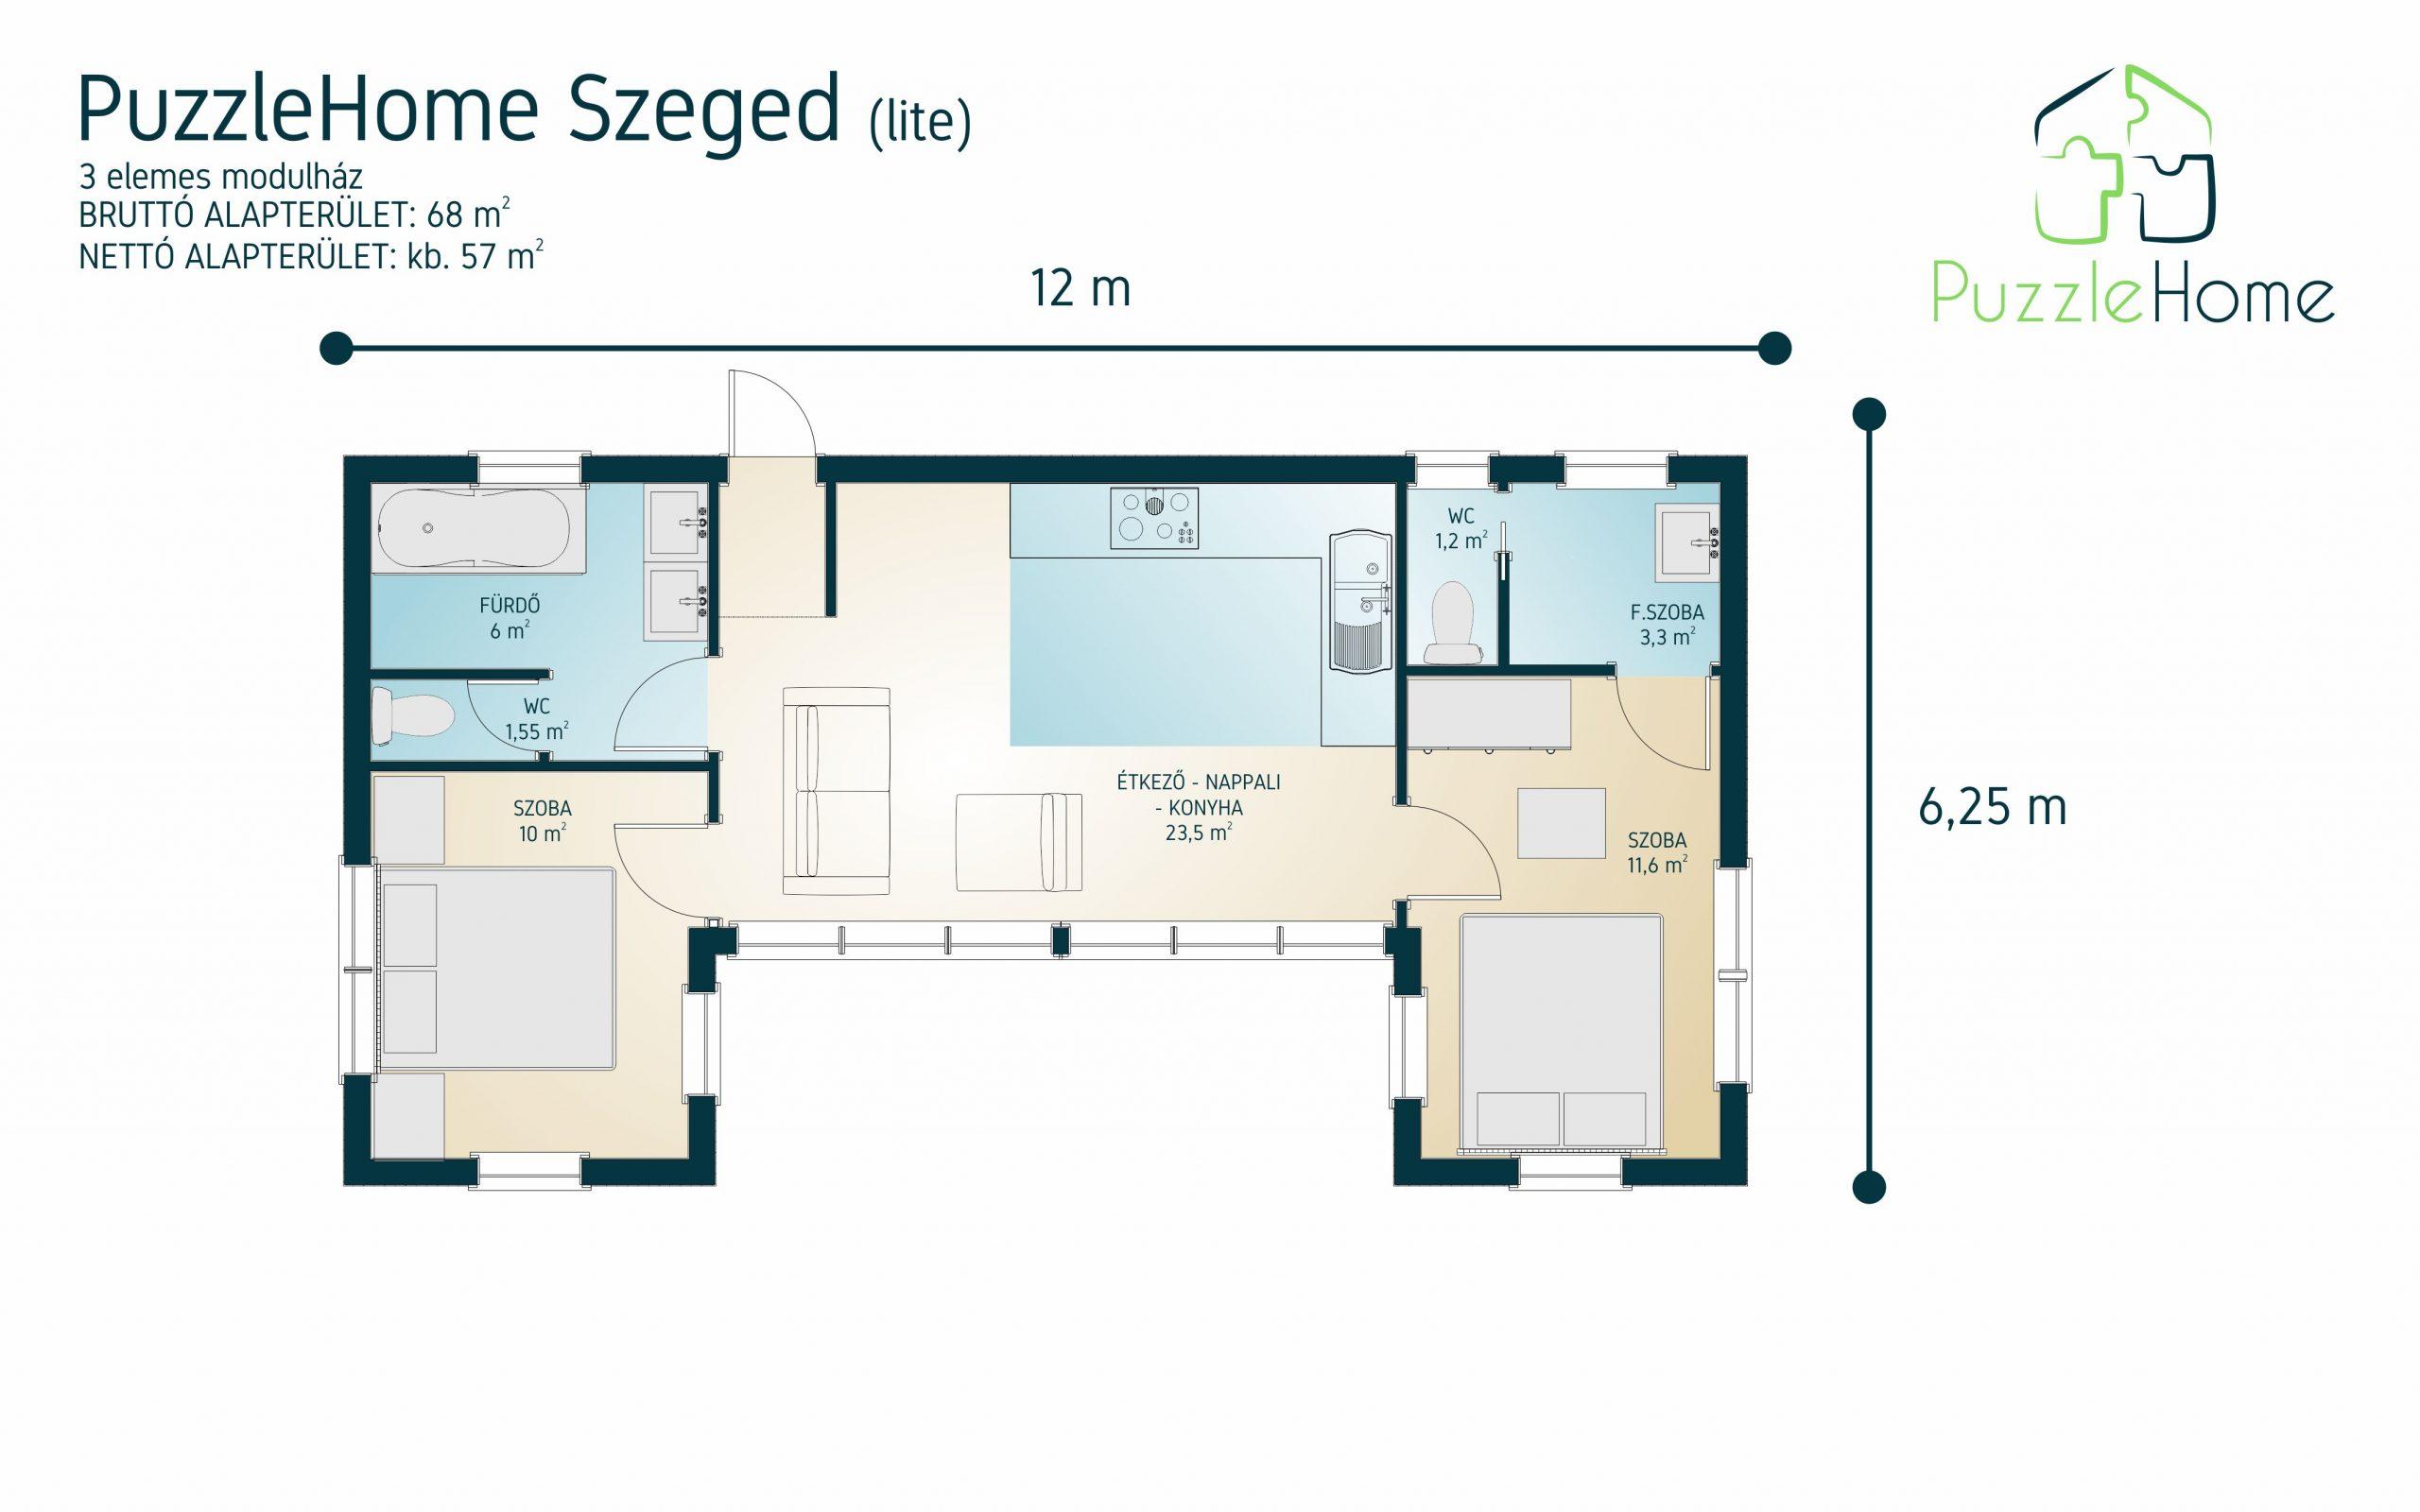 PuzzleHome Szeged Lite típusterv alaprajz